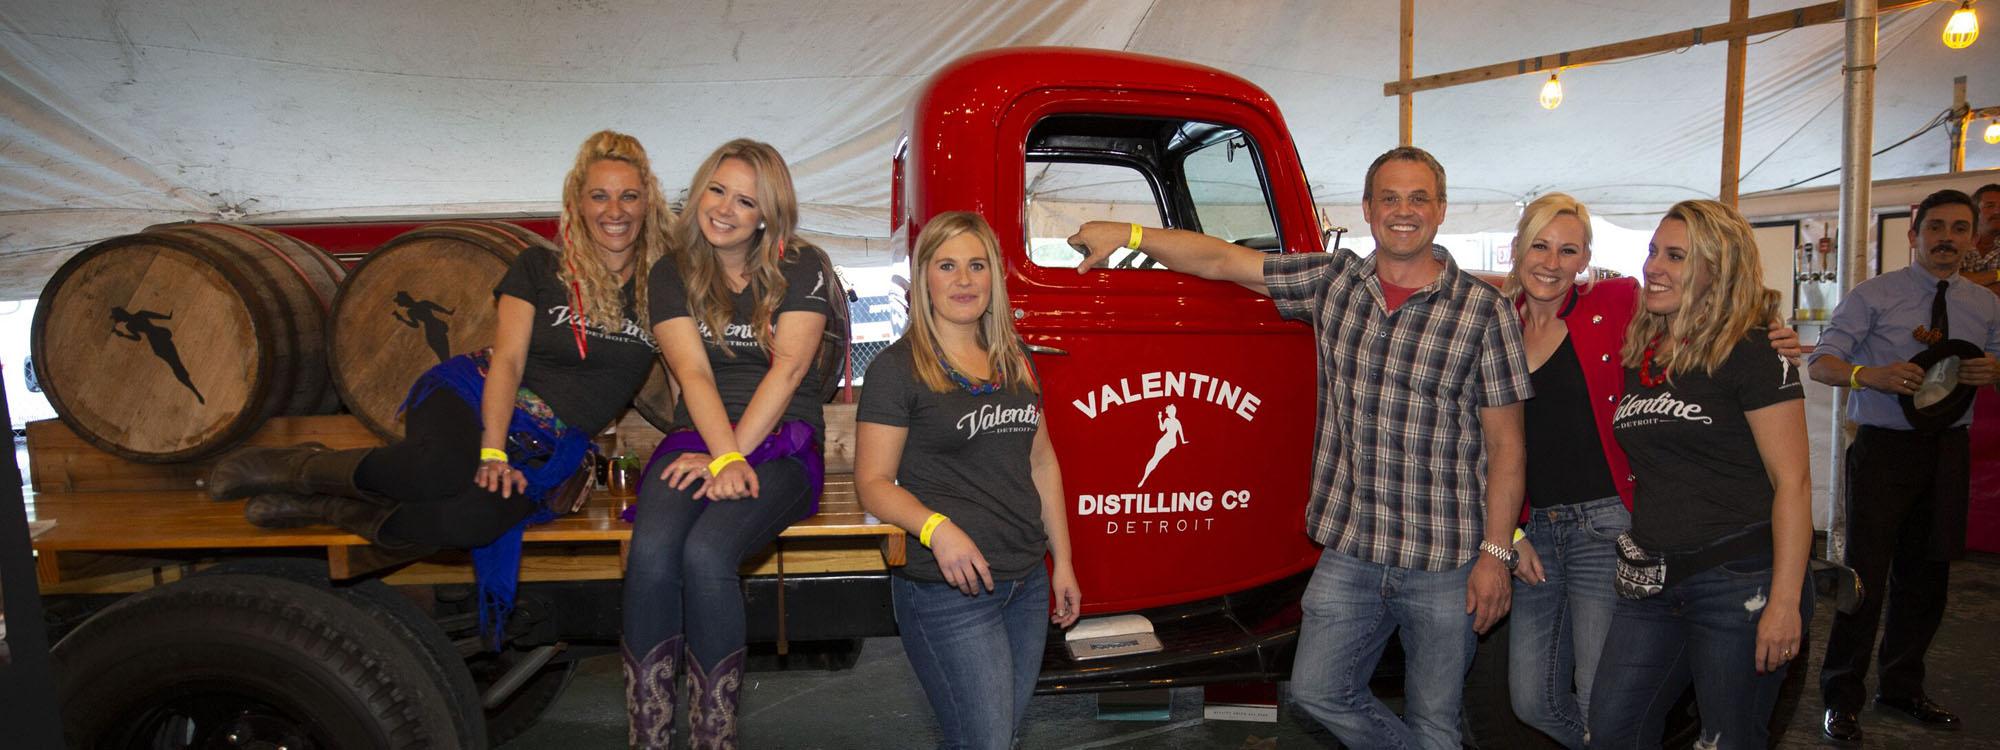 Valentine Distilling Co at Cedar Polka Fest